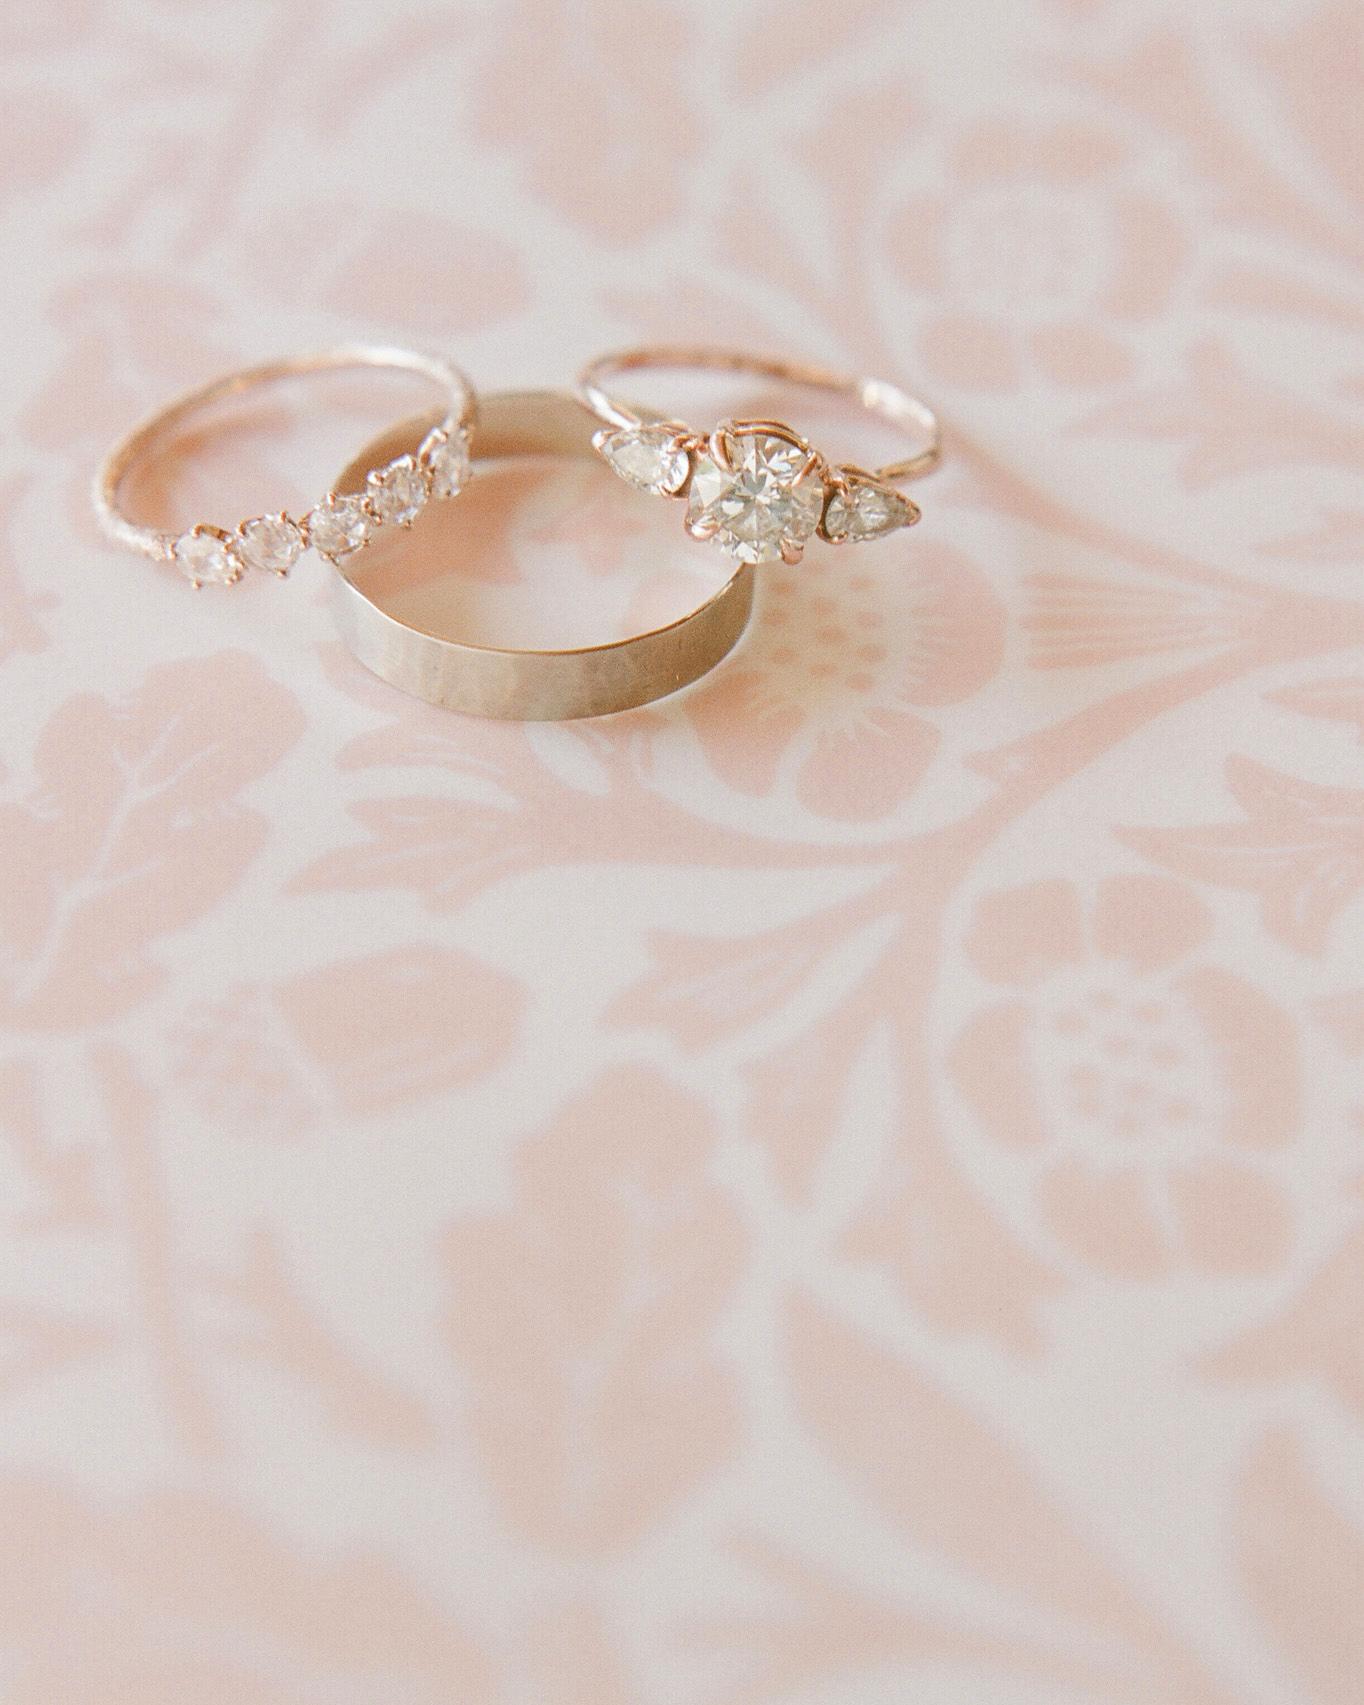 26 Rose Gold Engagement Rings We Love